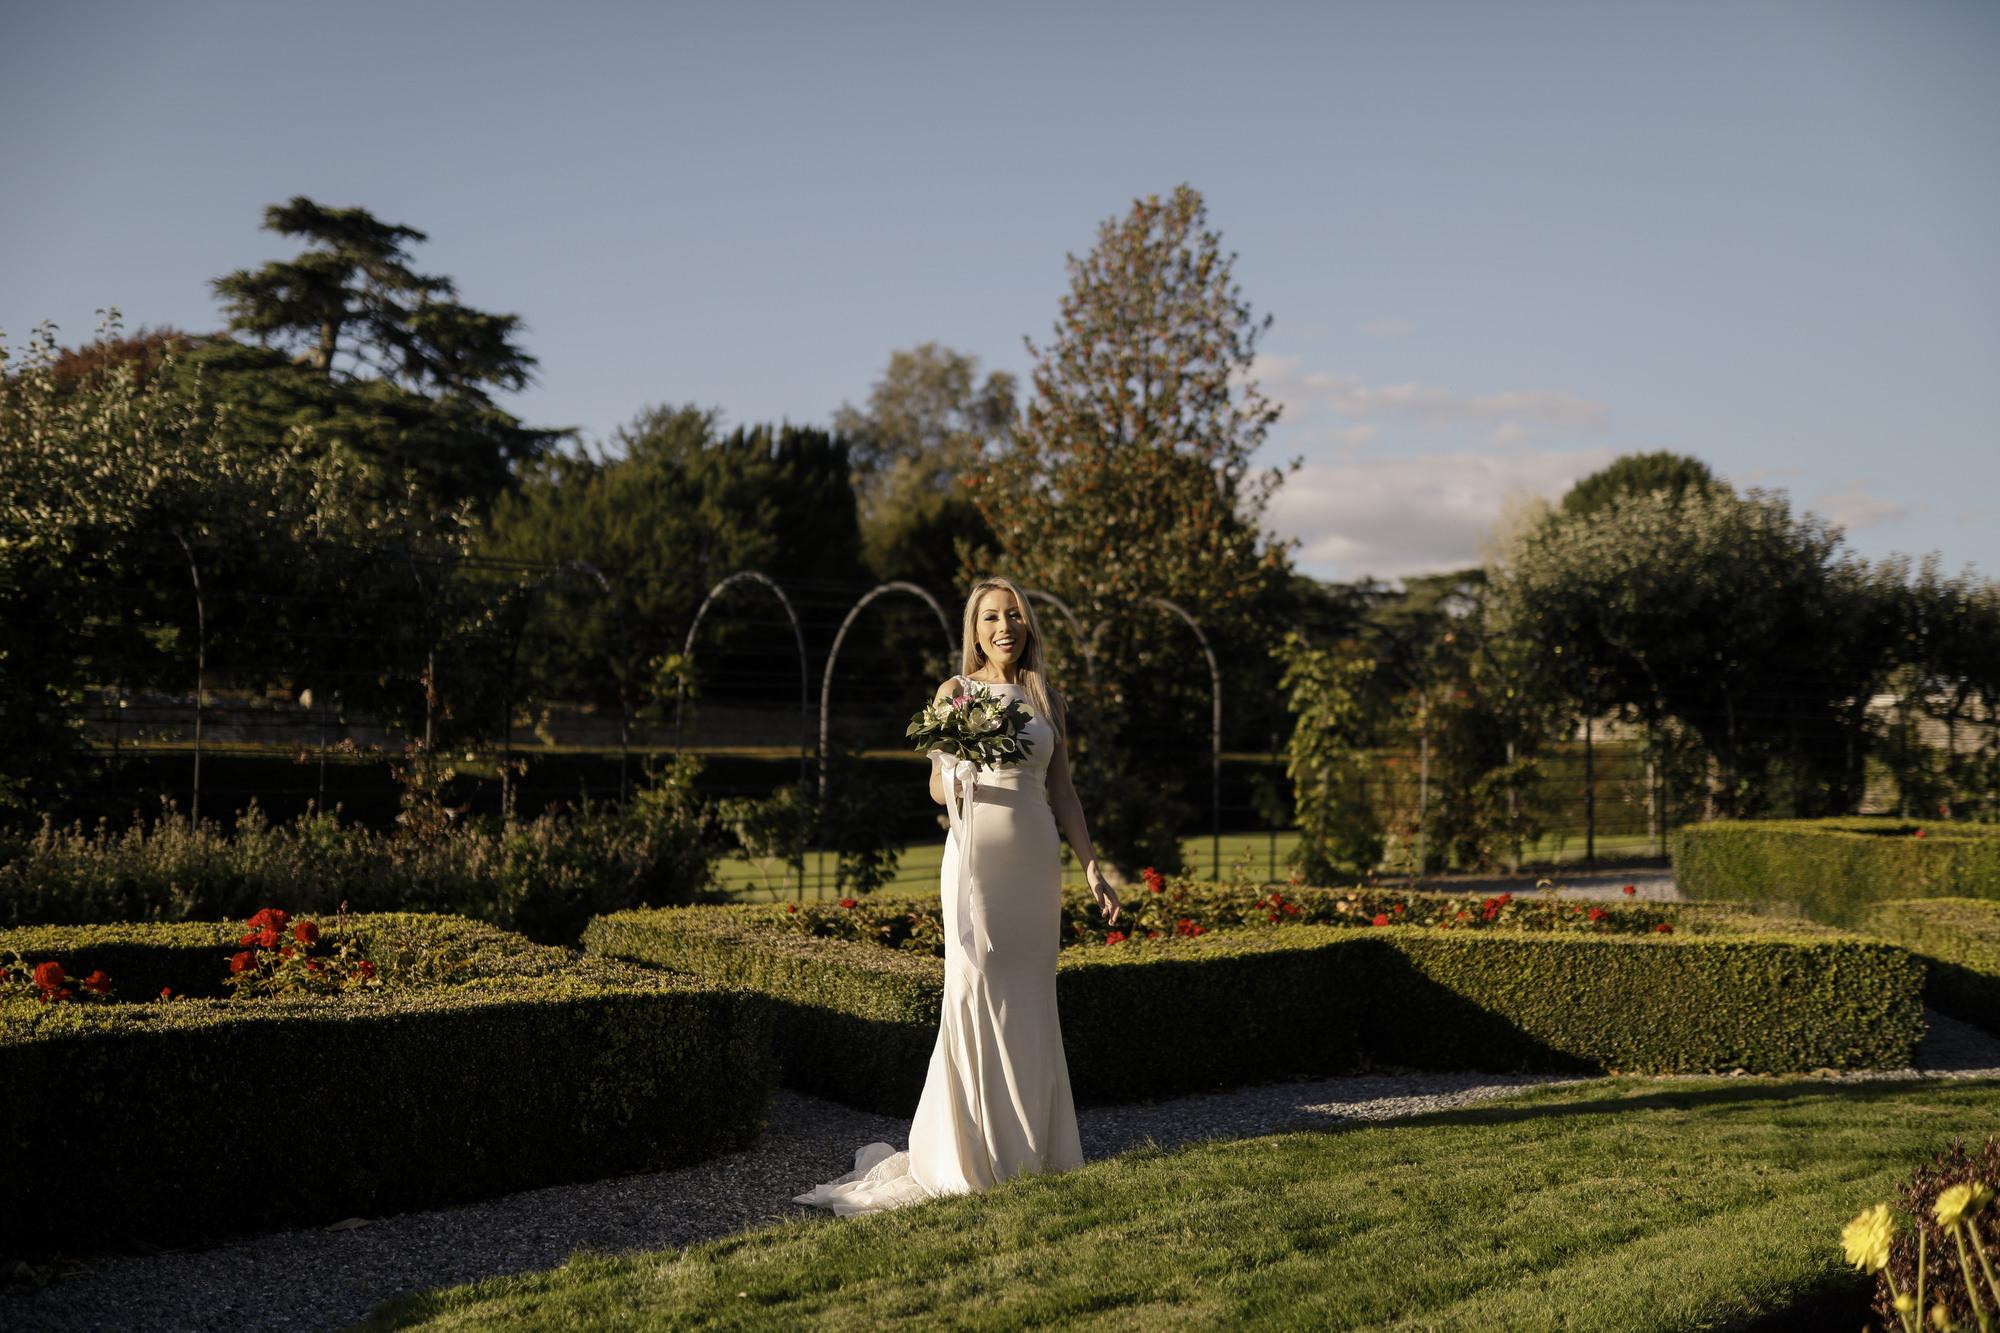 kilkea_castle_wedding_photographer_goldenmoments_049.jpg